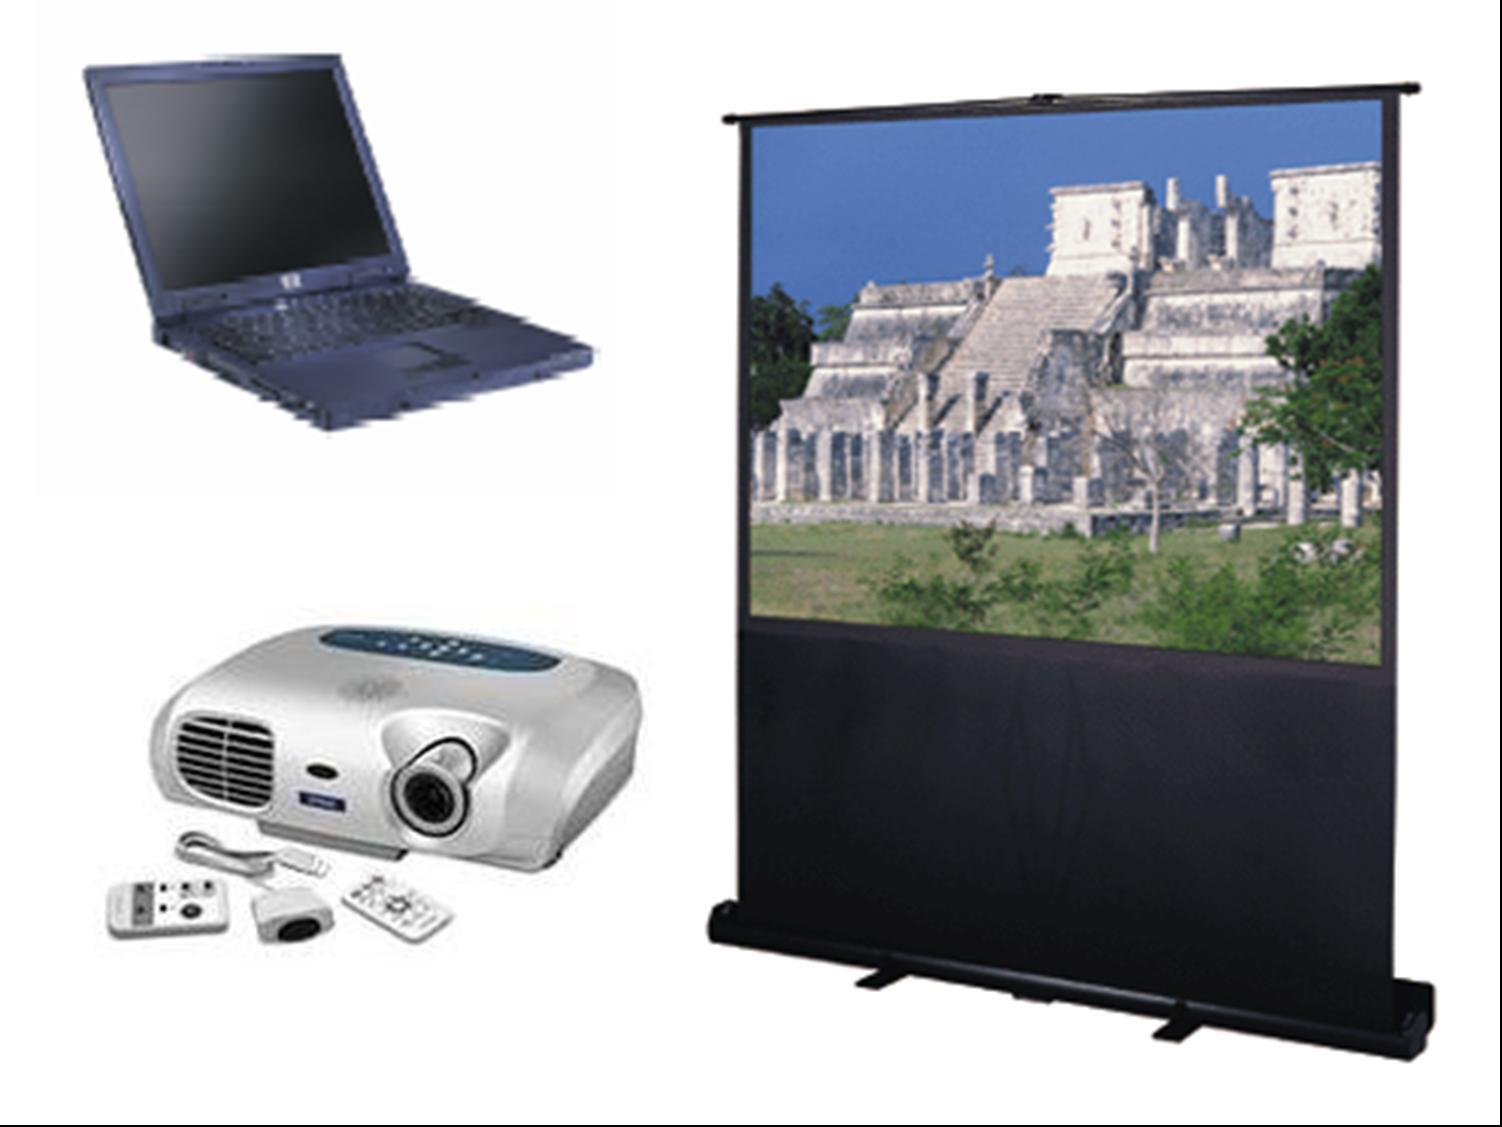 alquiler de equipos audiovisuales  clasificados